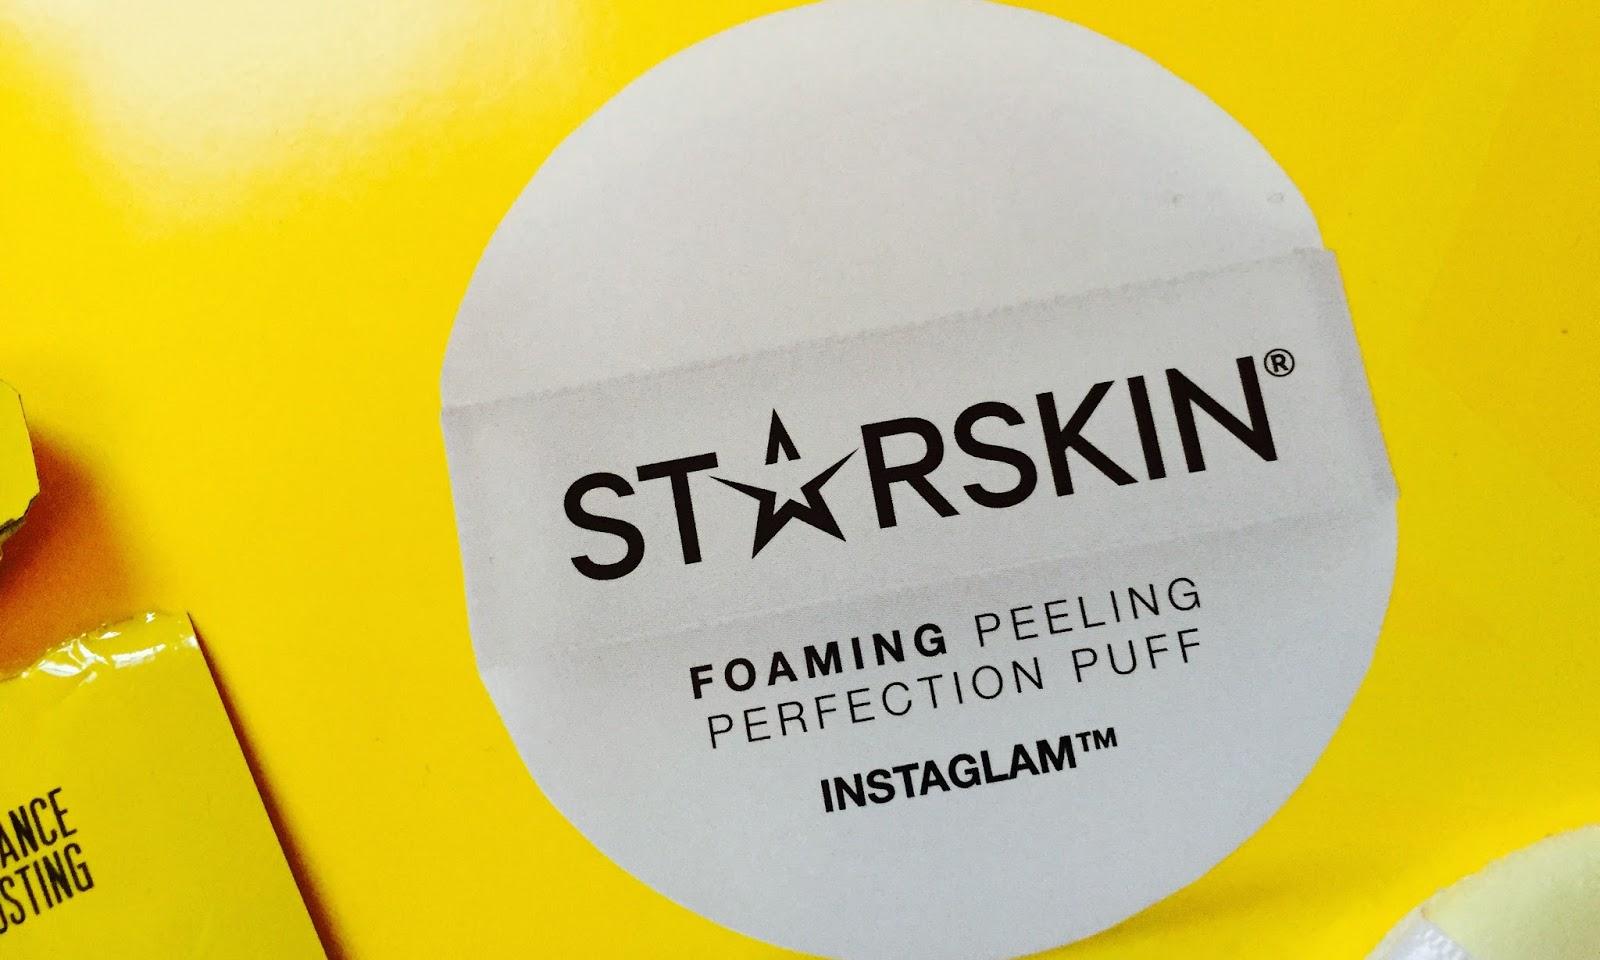 Starskin Foaming Peel Perfection Puff